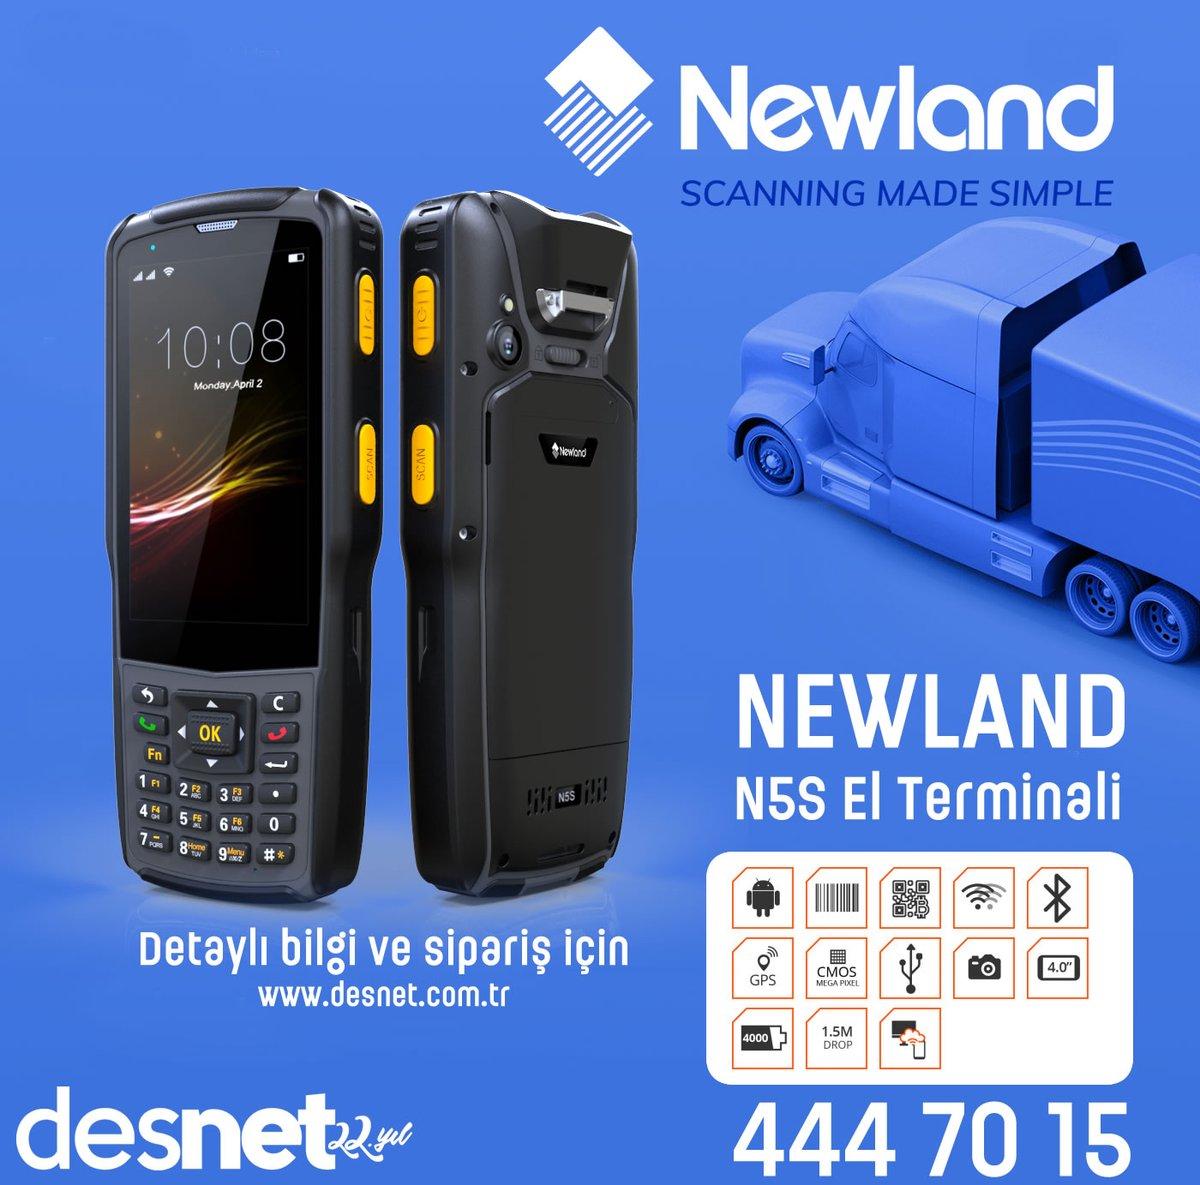 NEWLAND N5S Android El Terminali Desnet'te.  #newland @Newland_AIDC #n5s #elterminali  https://www.desnet.com.tr/urun/newland-n5s-el-terminali/…pic.twitter.com/7dKsRwpoYh